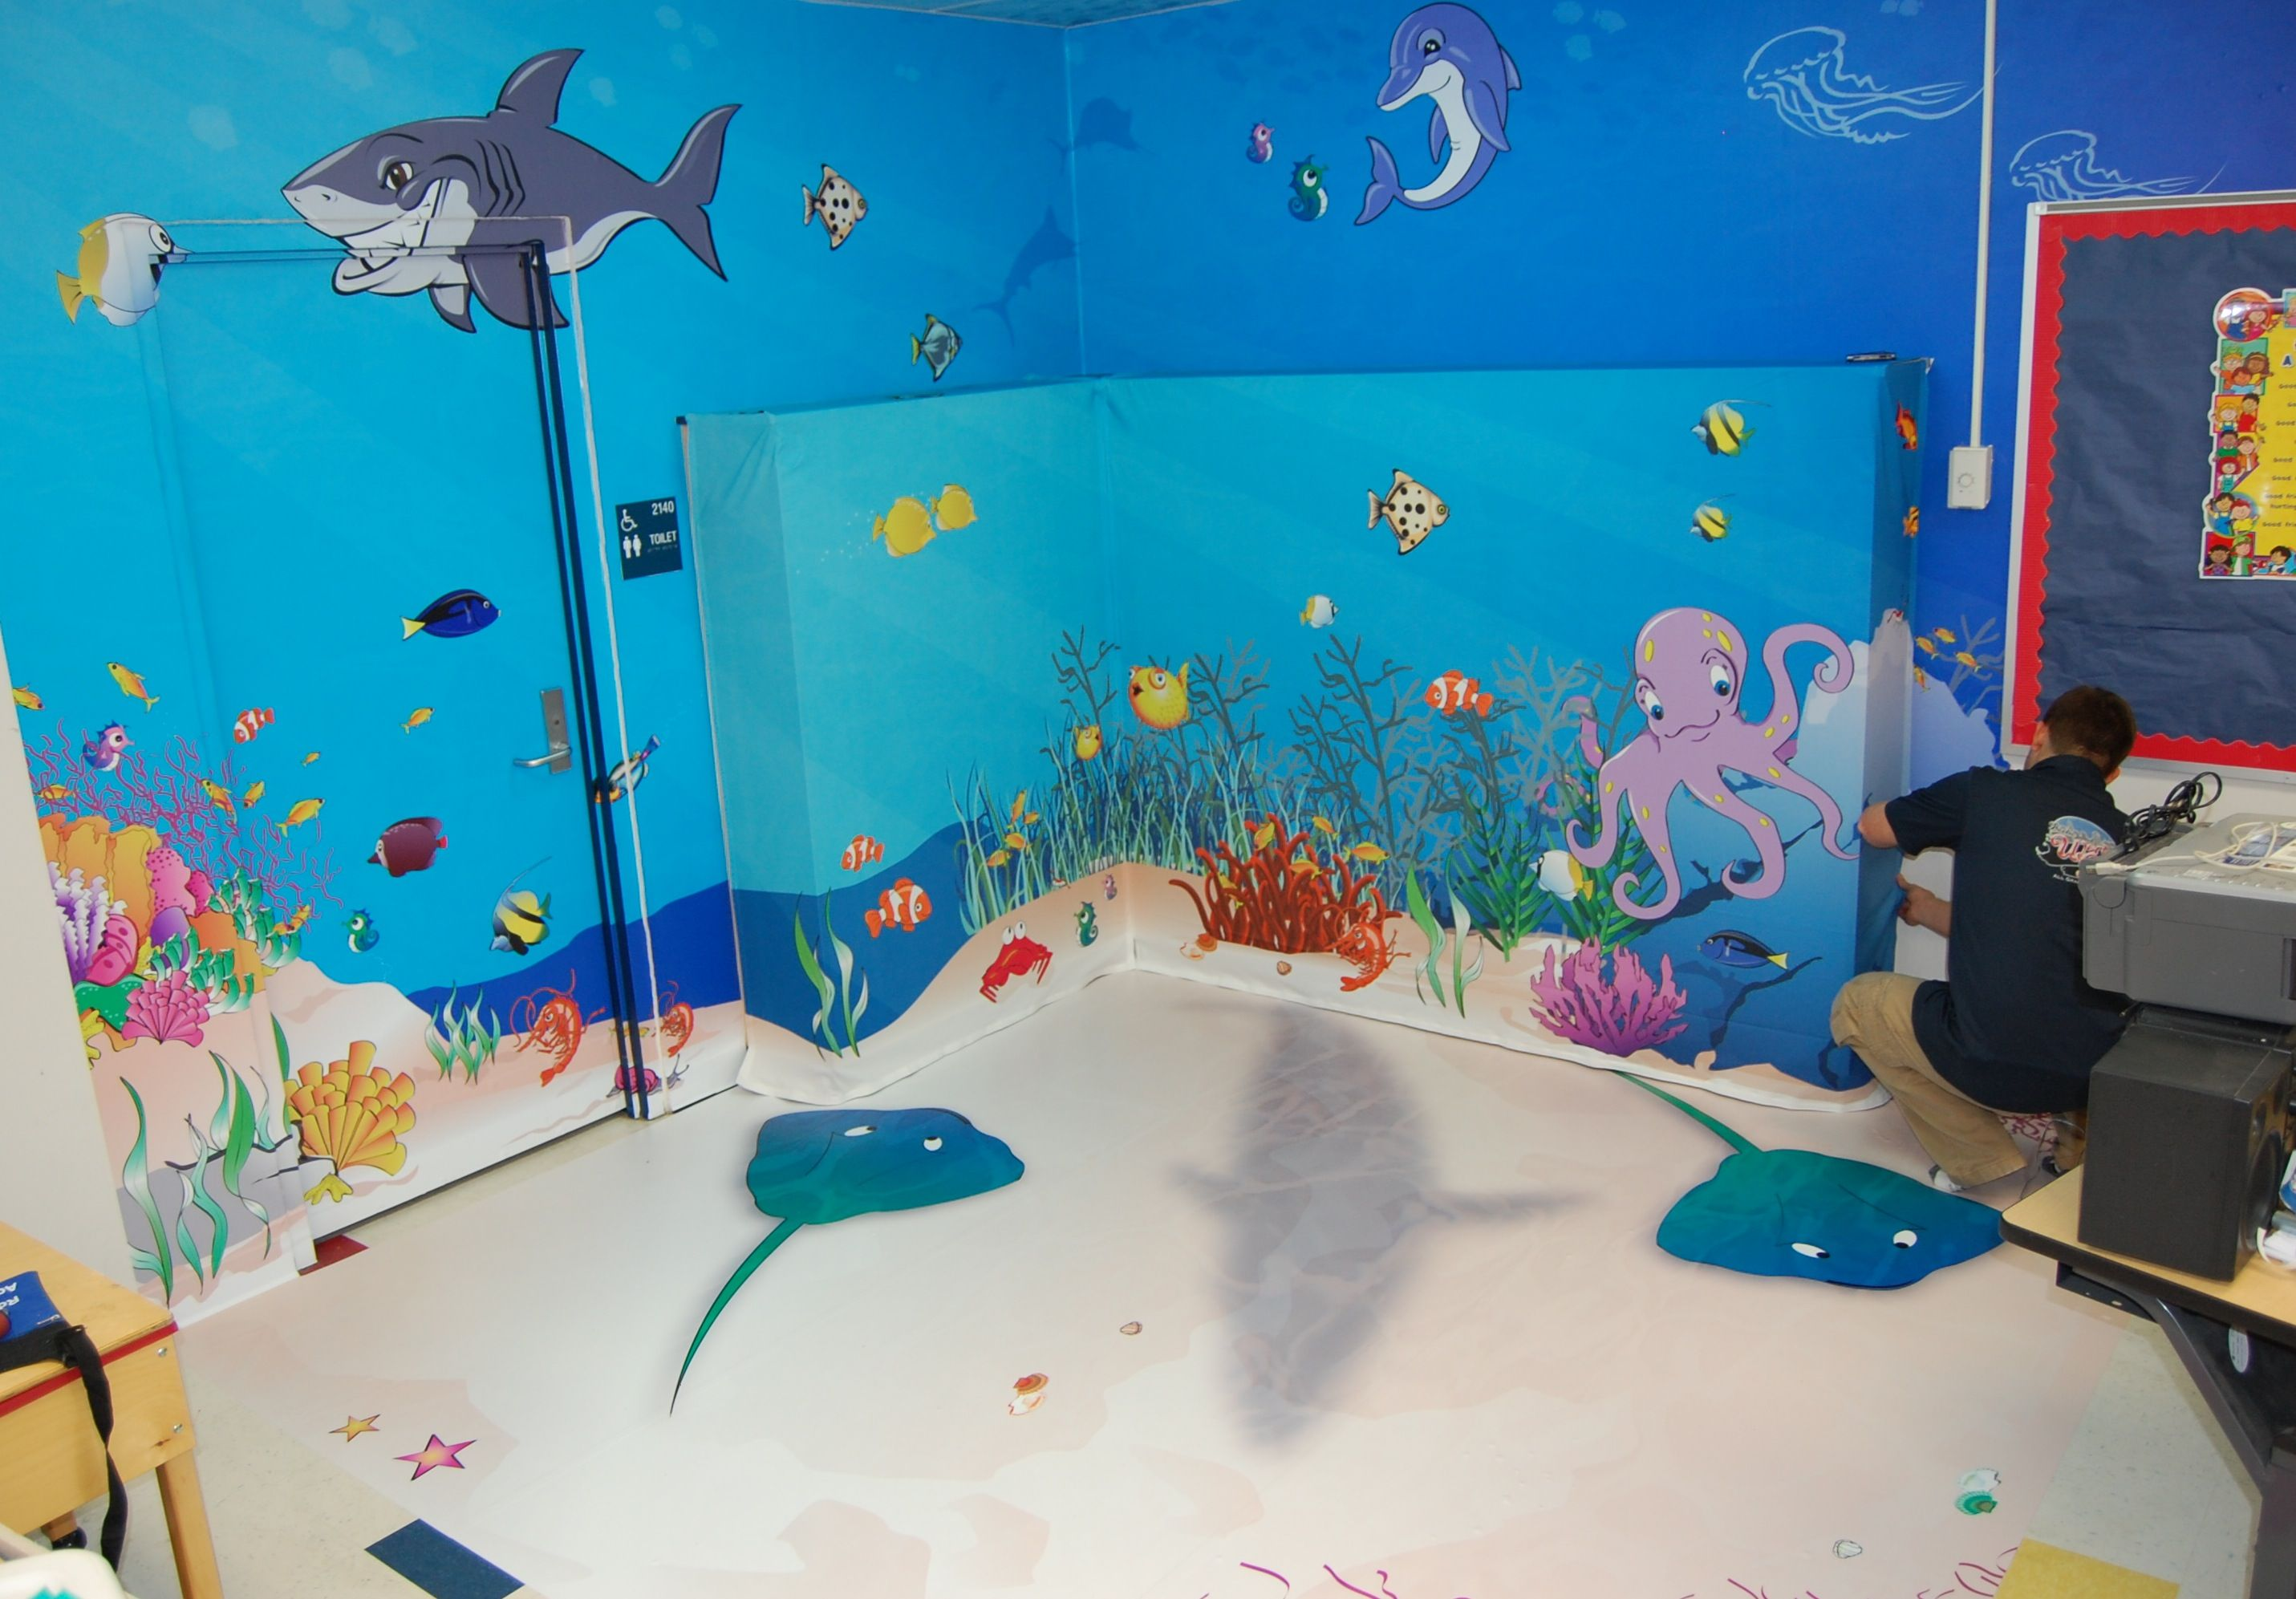 Ocean Decoration For Classroom : Under the sea classroom calming area